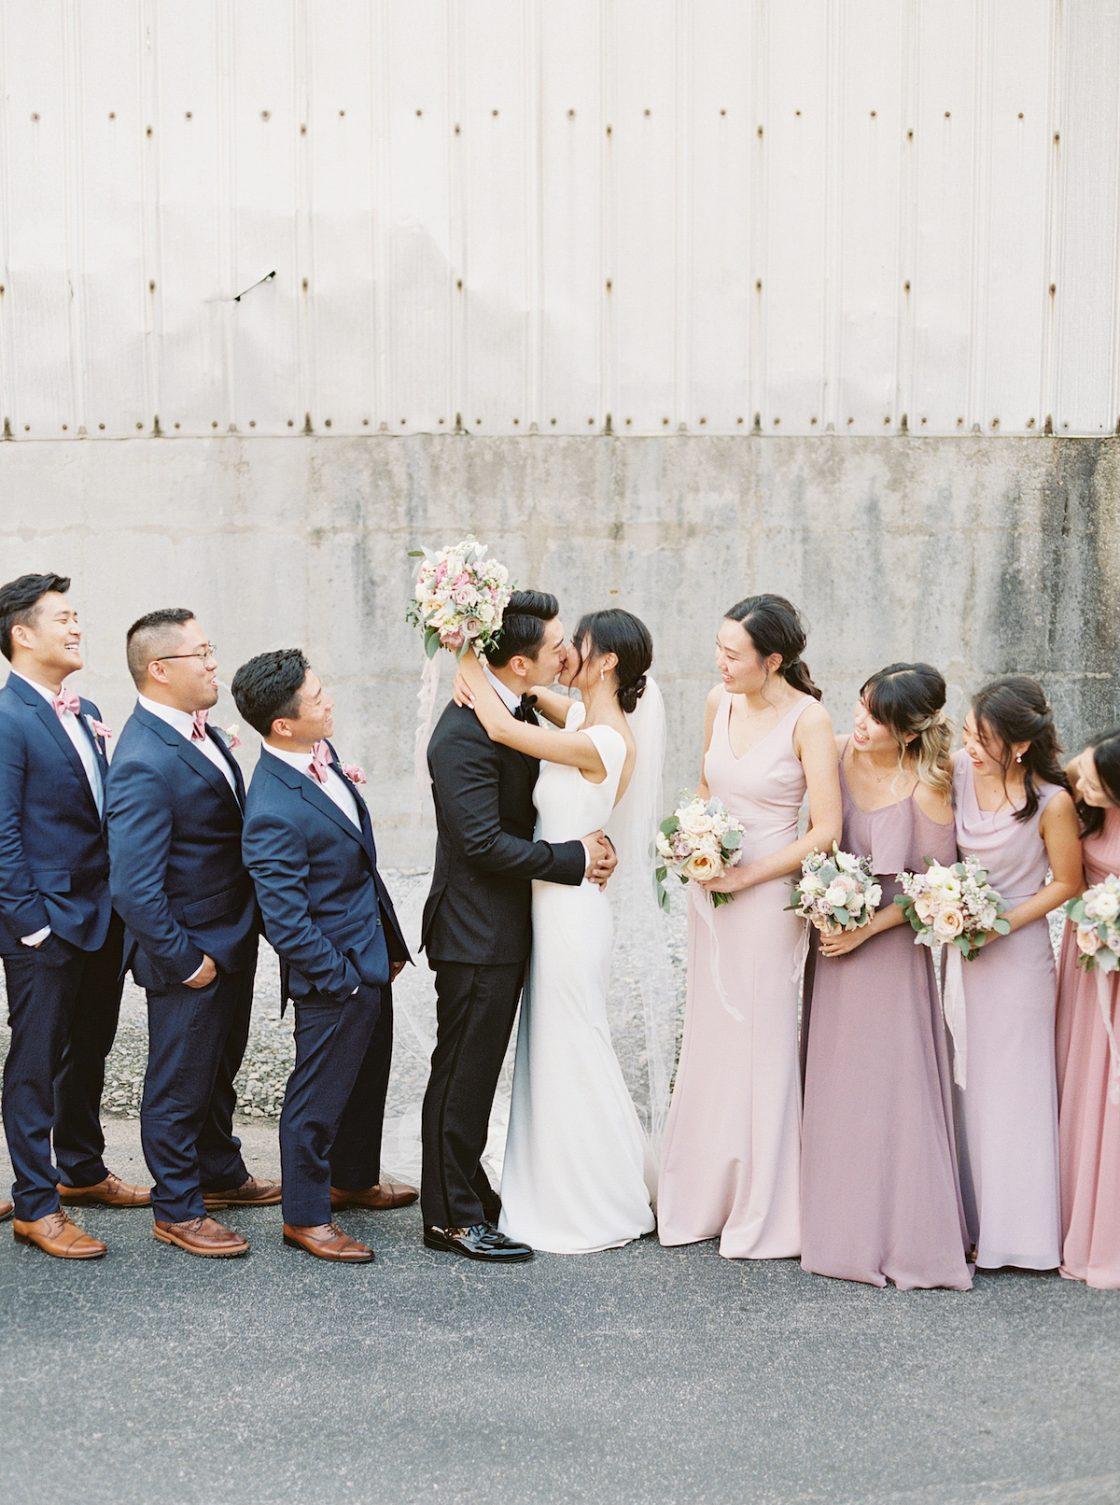 Elegant Urban Wedding Photo